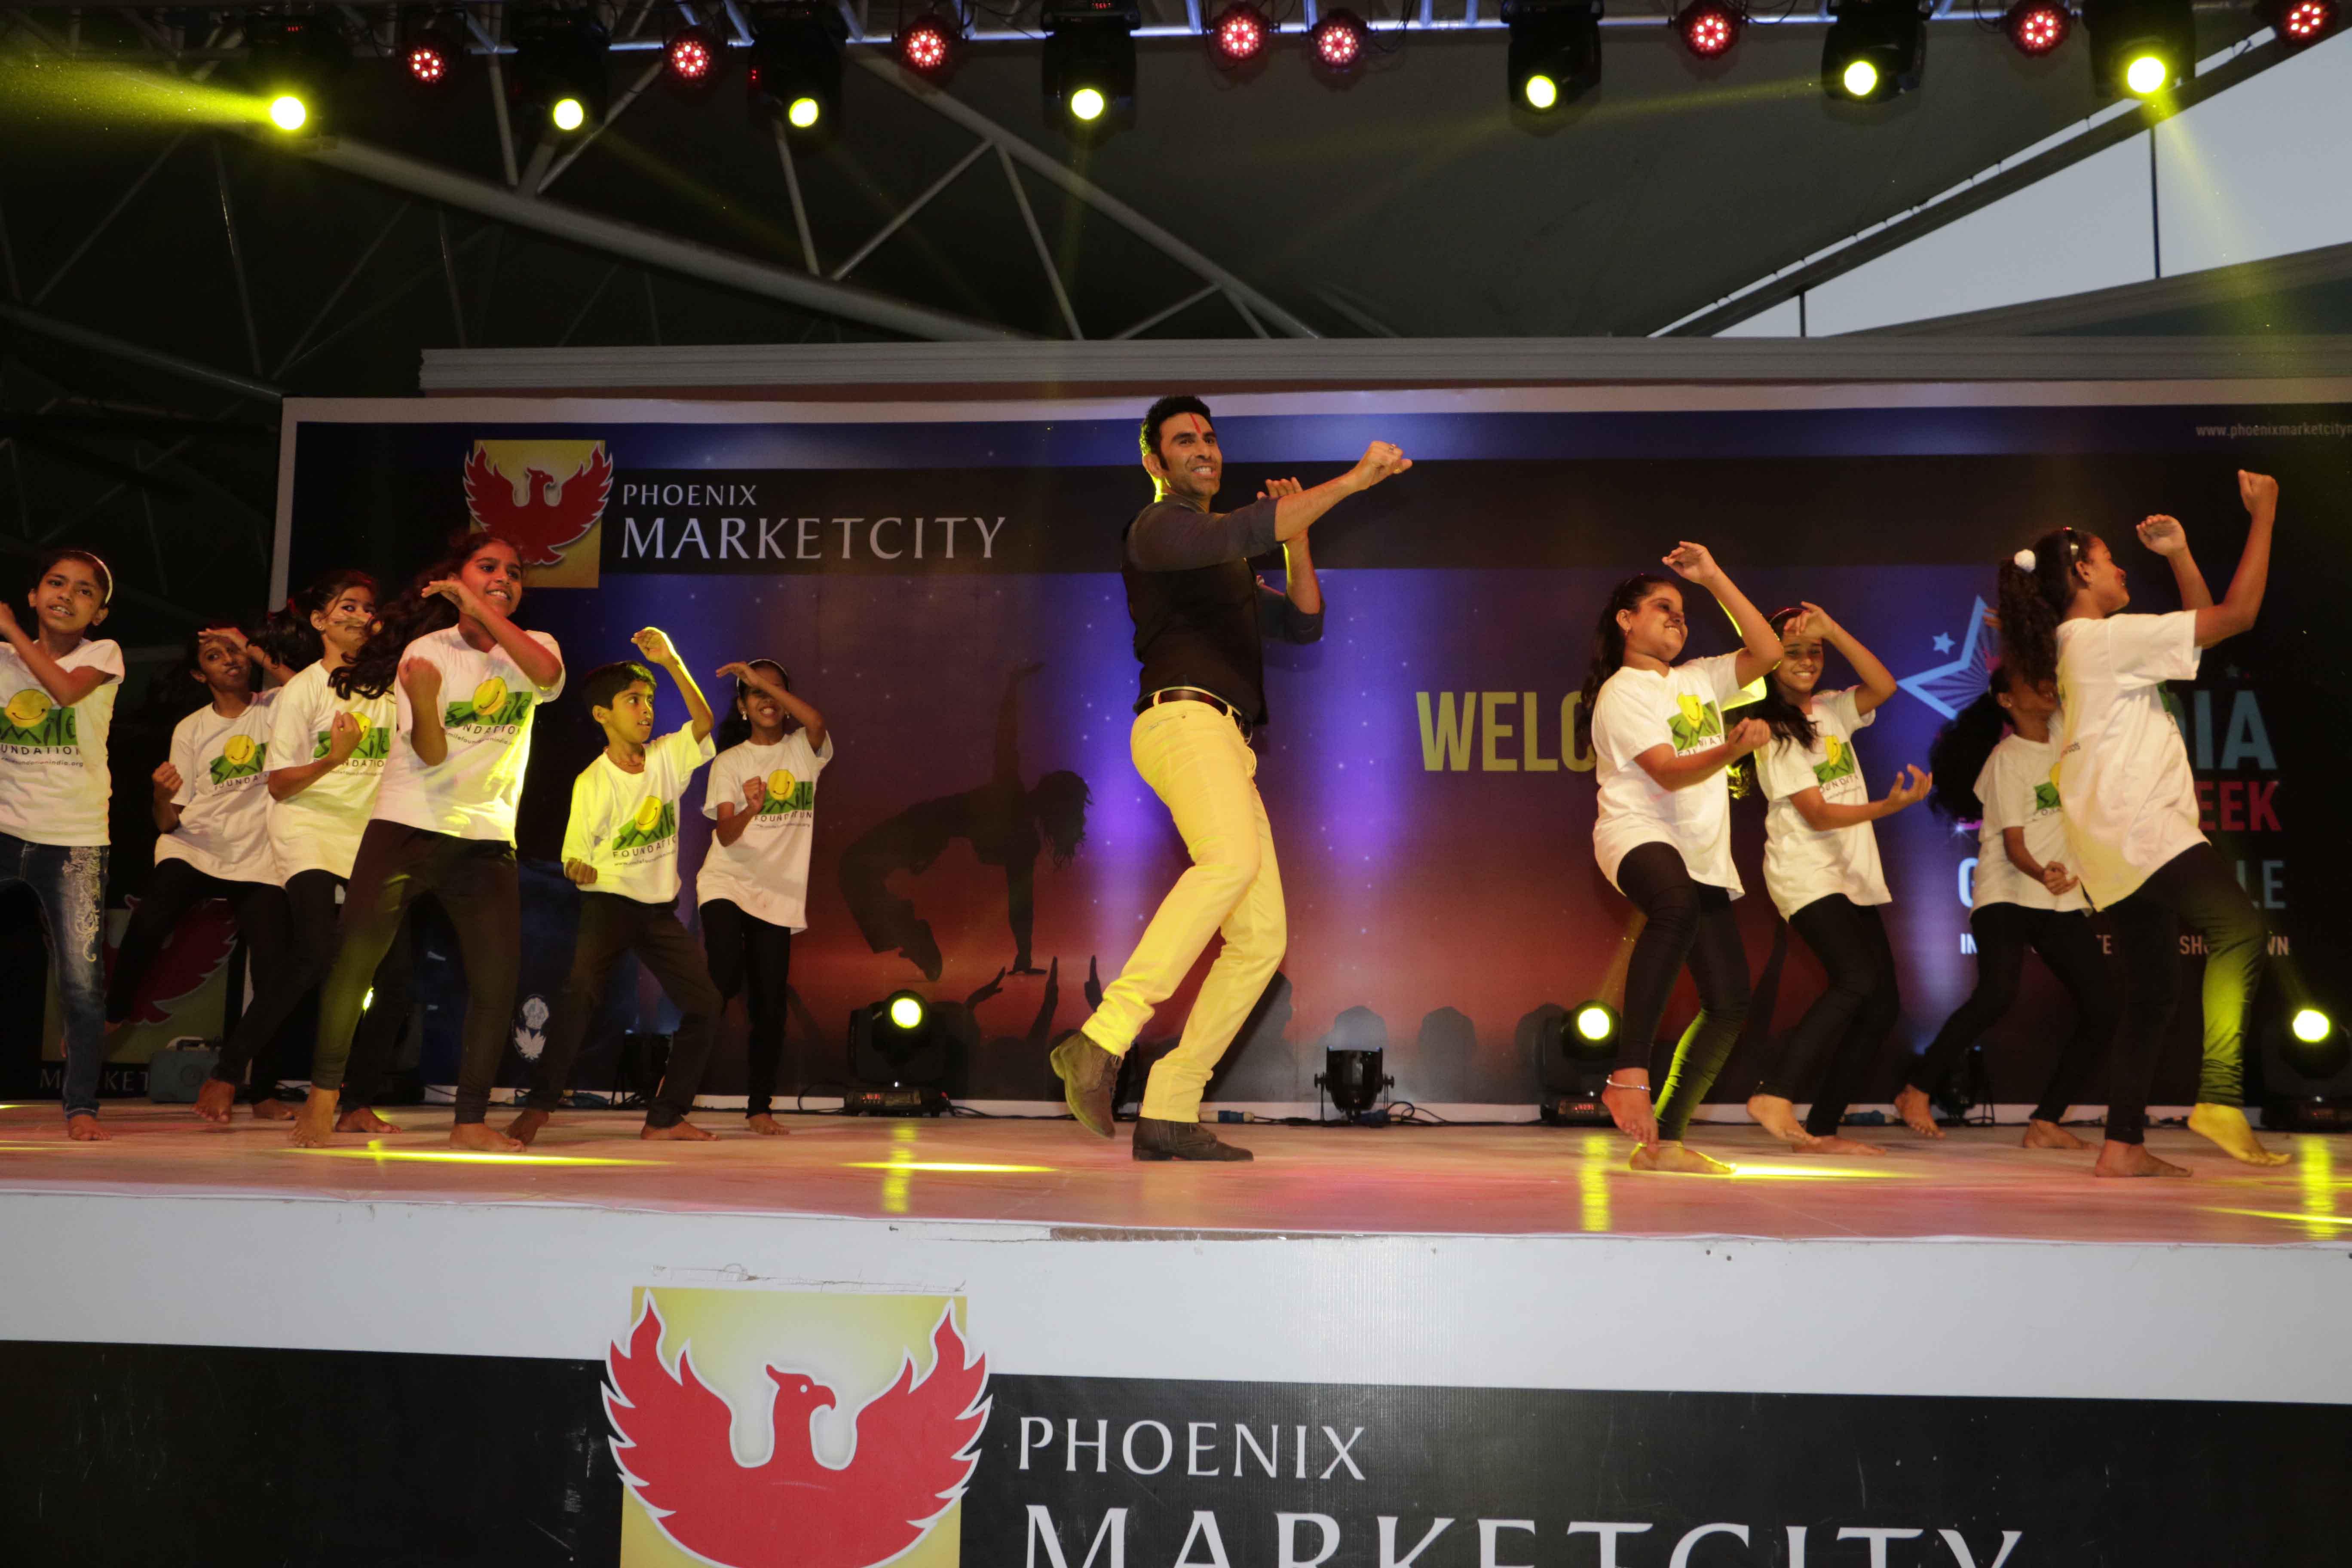 Sandip Soparrkar performing with Smile Foundation Children1